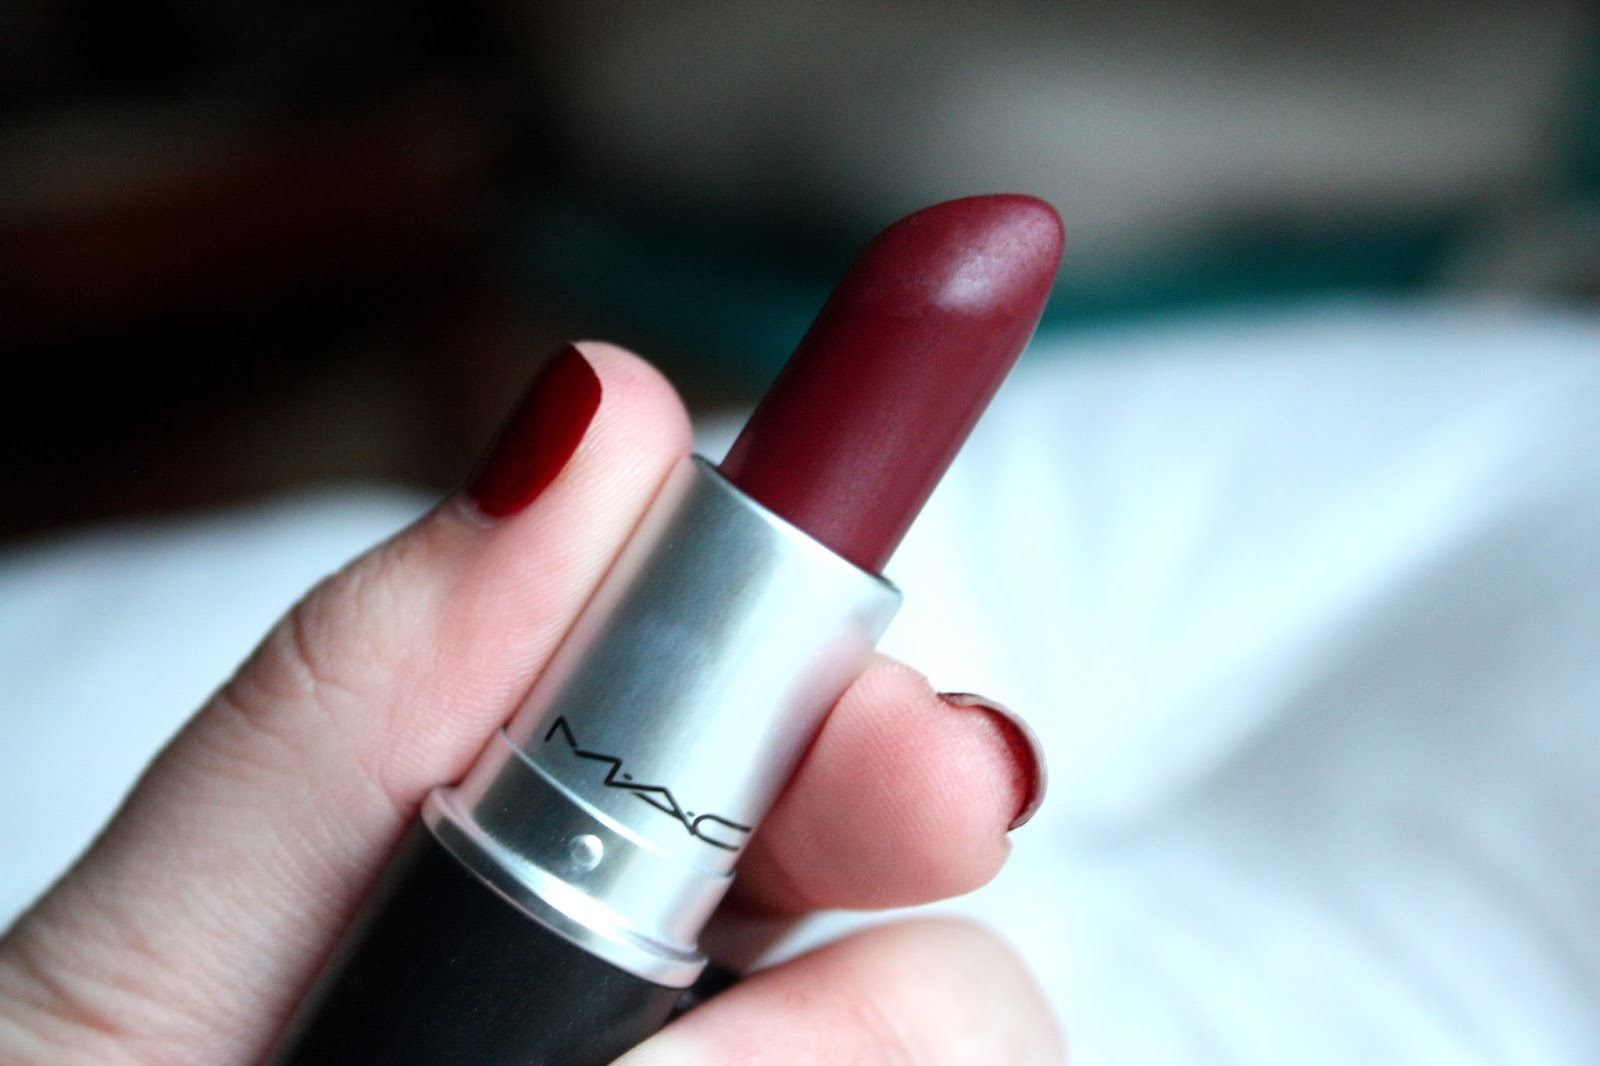 Ready Set Illuminate Mac Diva Ruj Mac Diva Lipstick